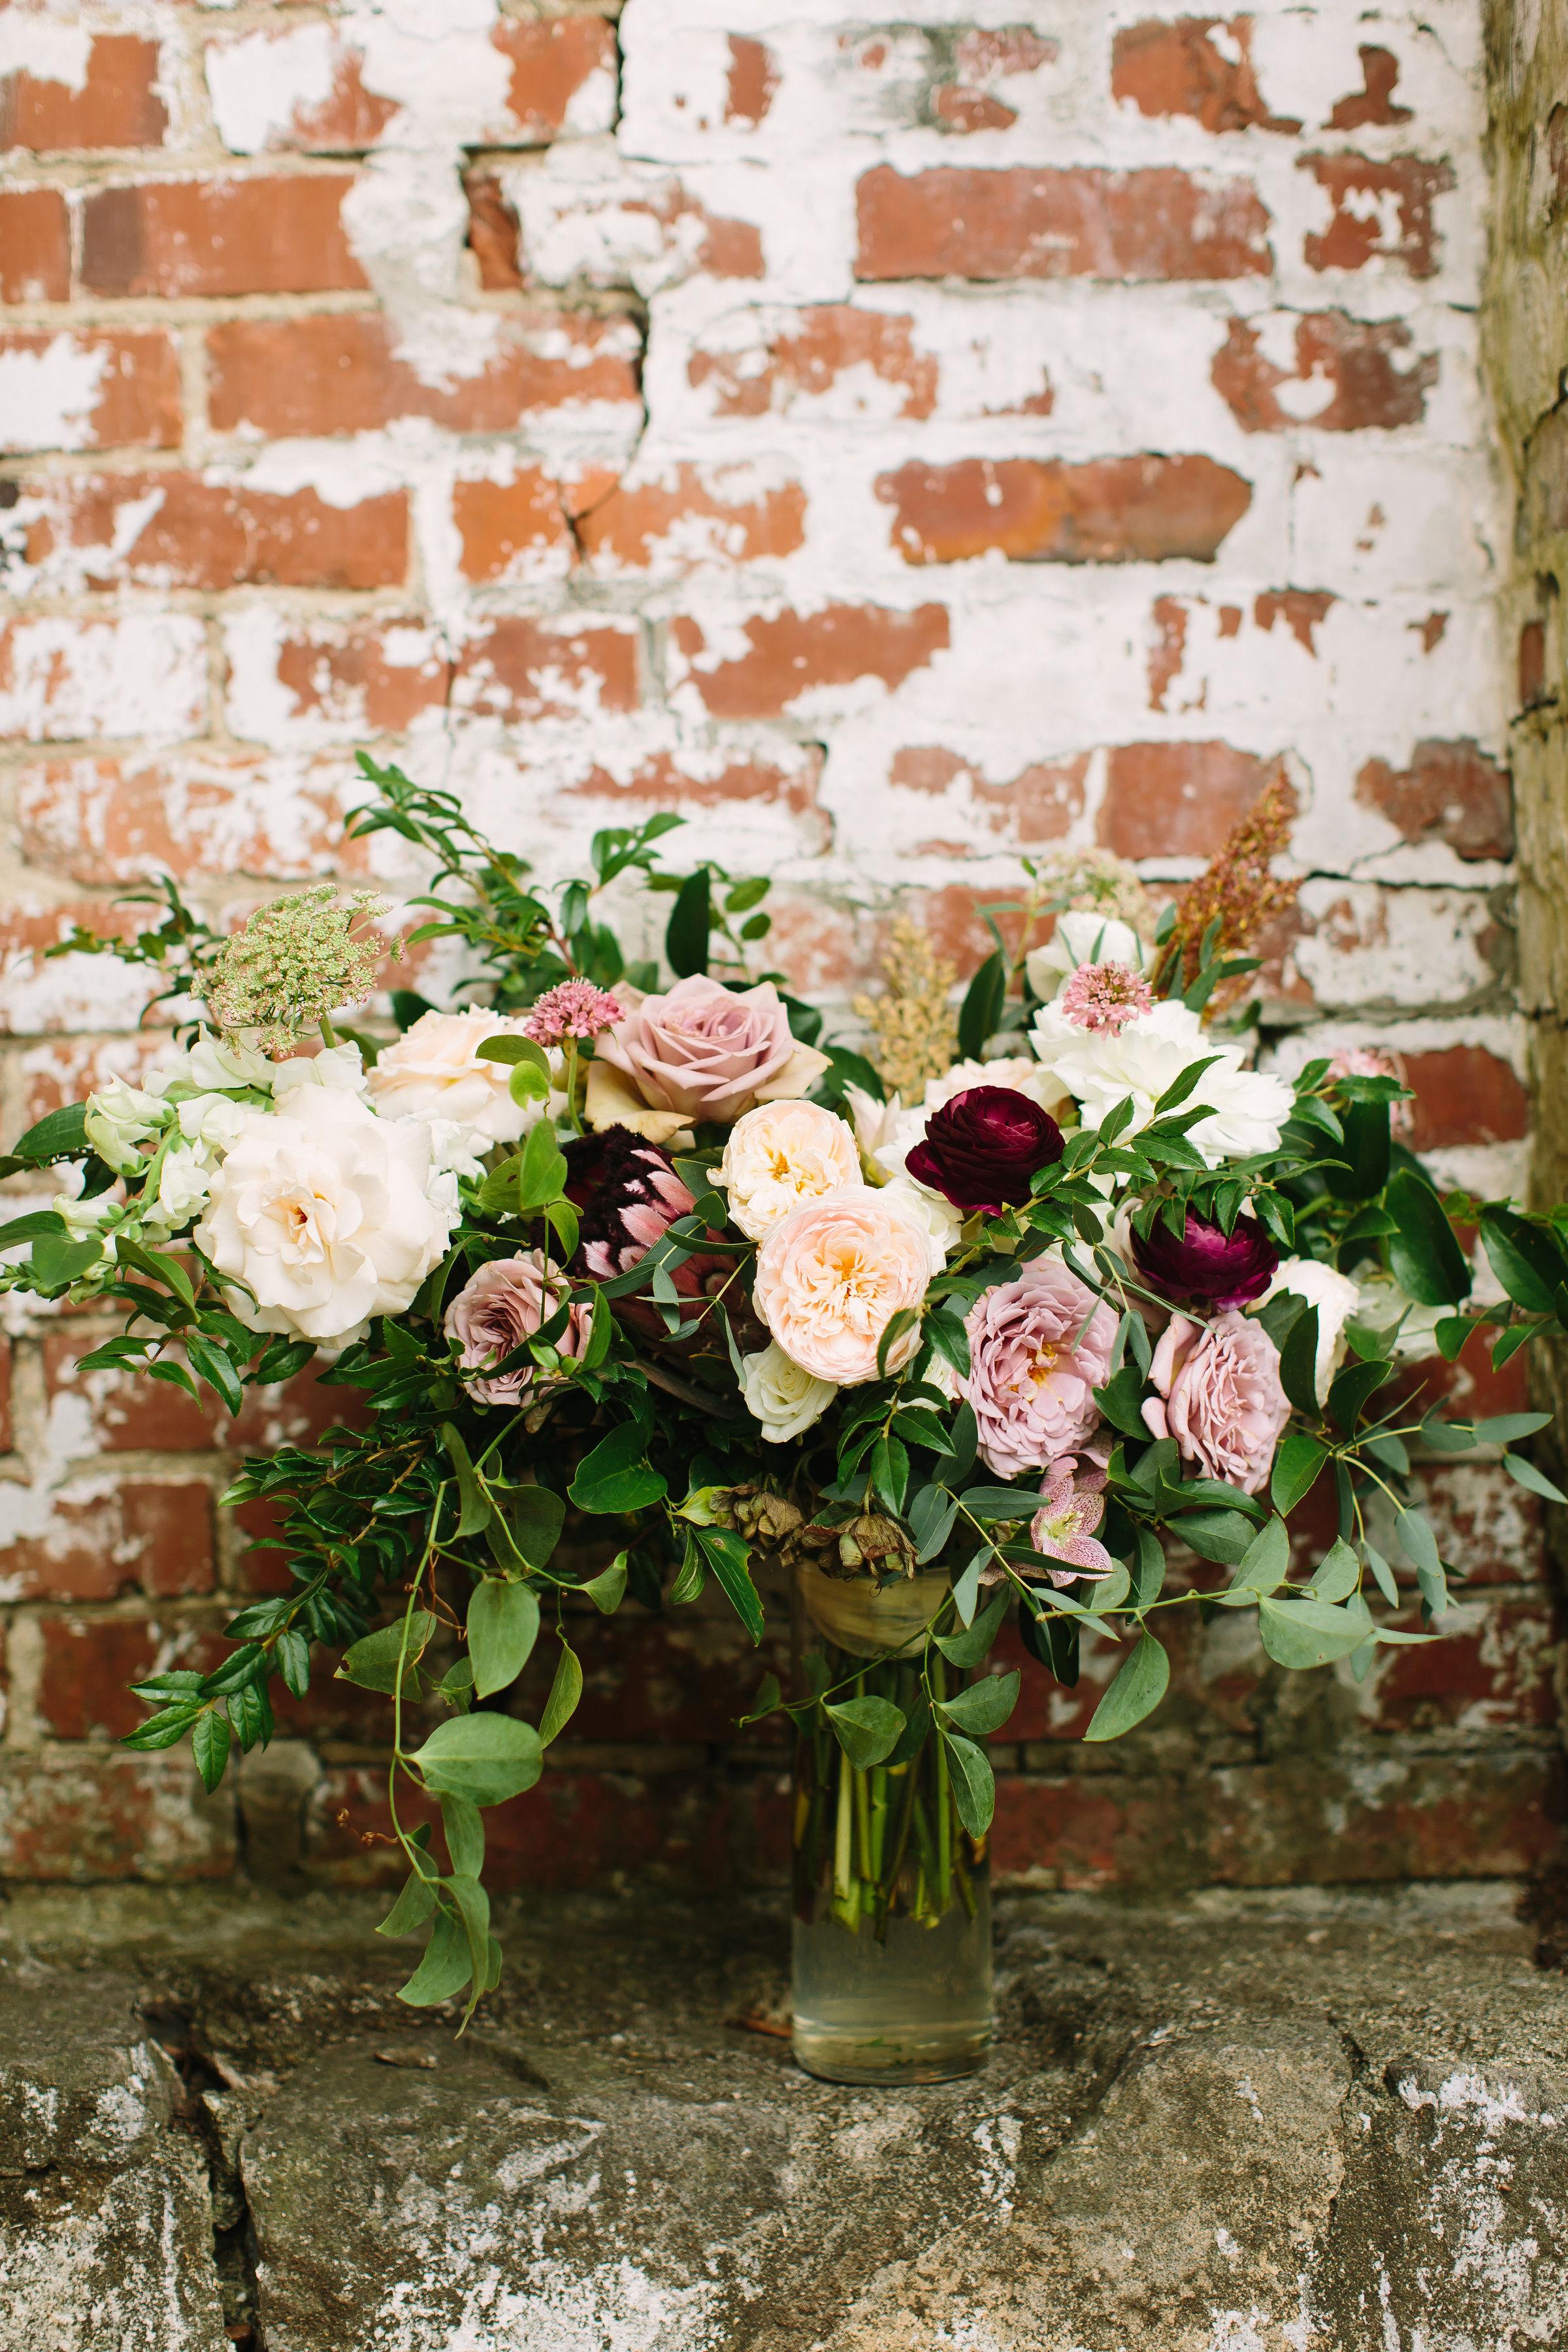 Lush, untamed bridal bouquet in shades of dusty mauve, ivory, blush, and greenery // Nashville Wedding Florist